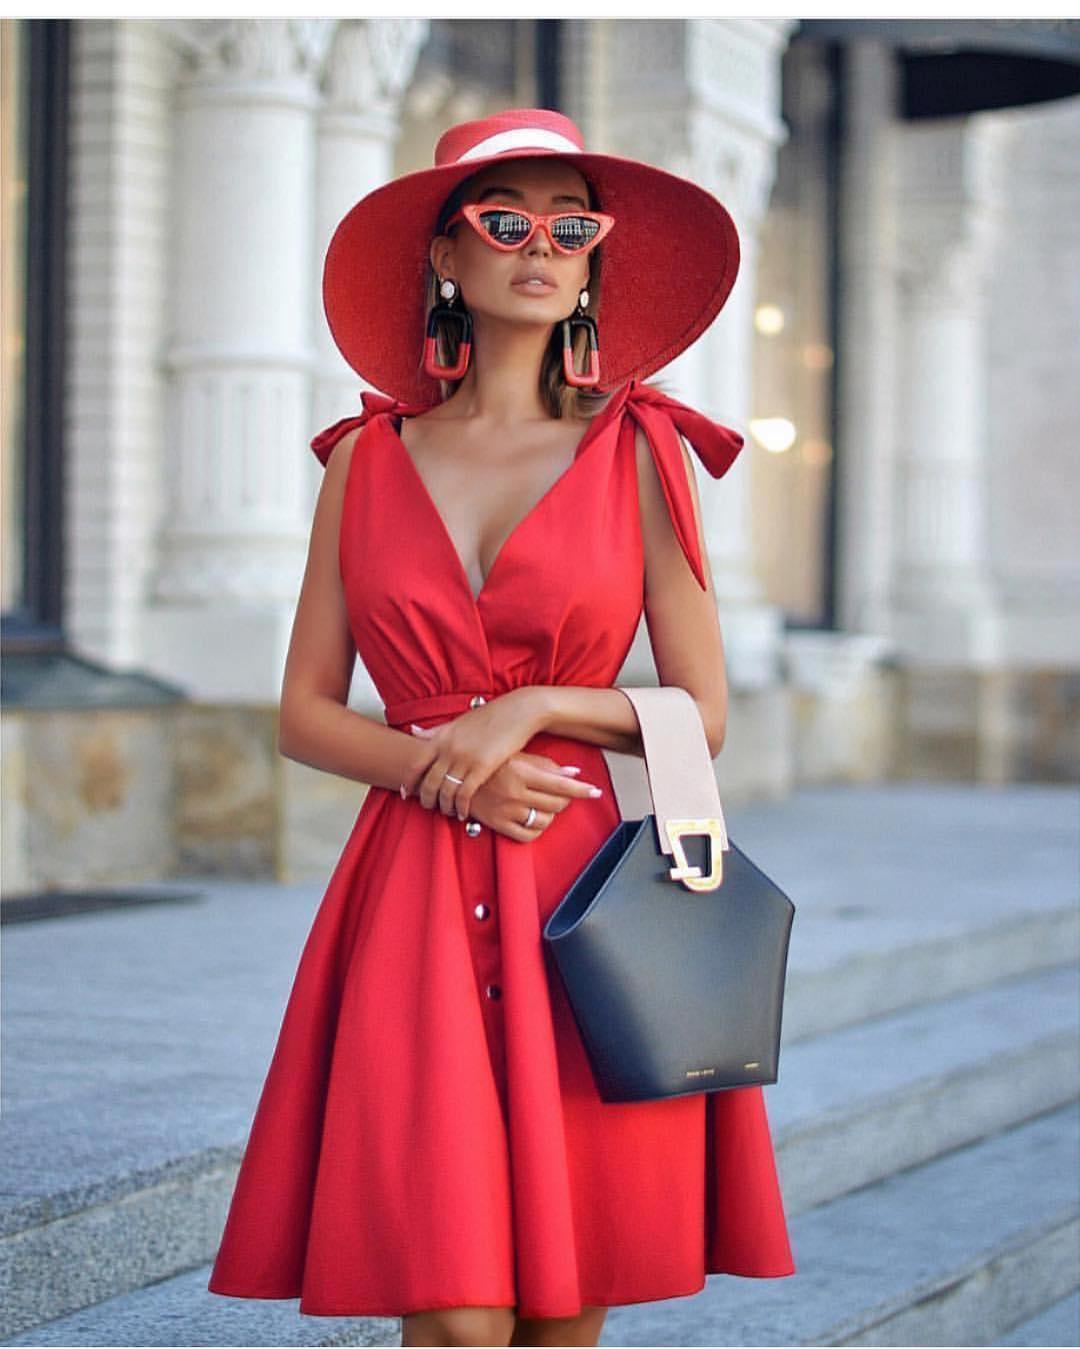 fashionstyles4love_2_4_2019_1_11_36_657.jpg